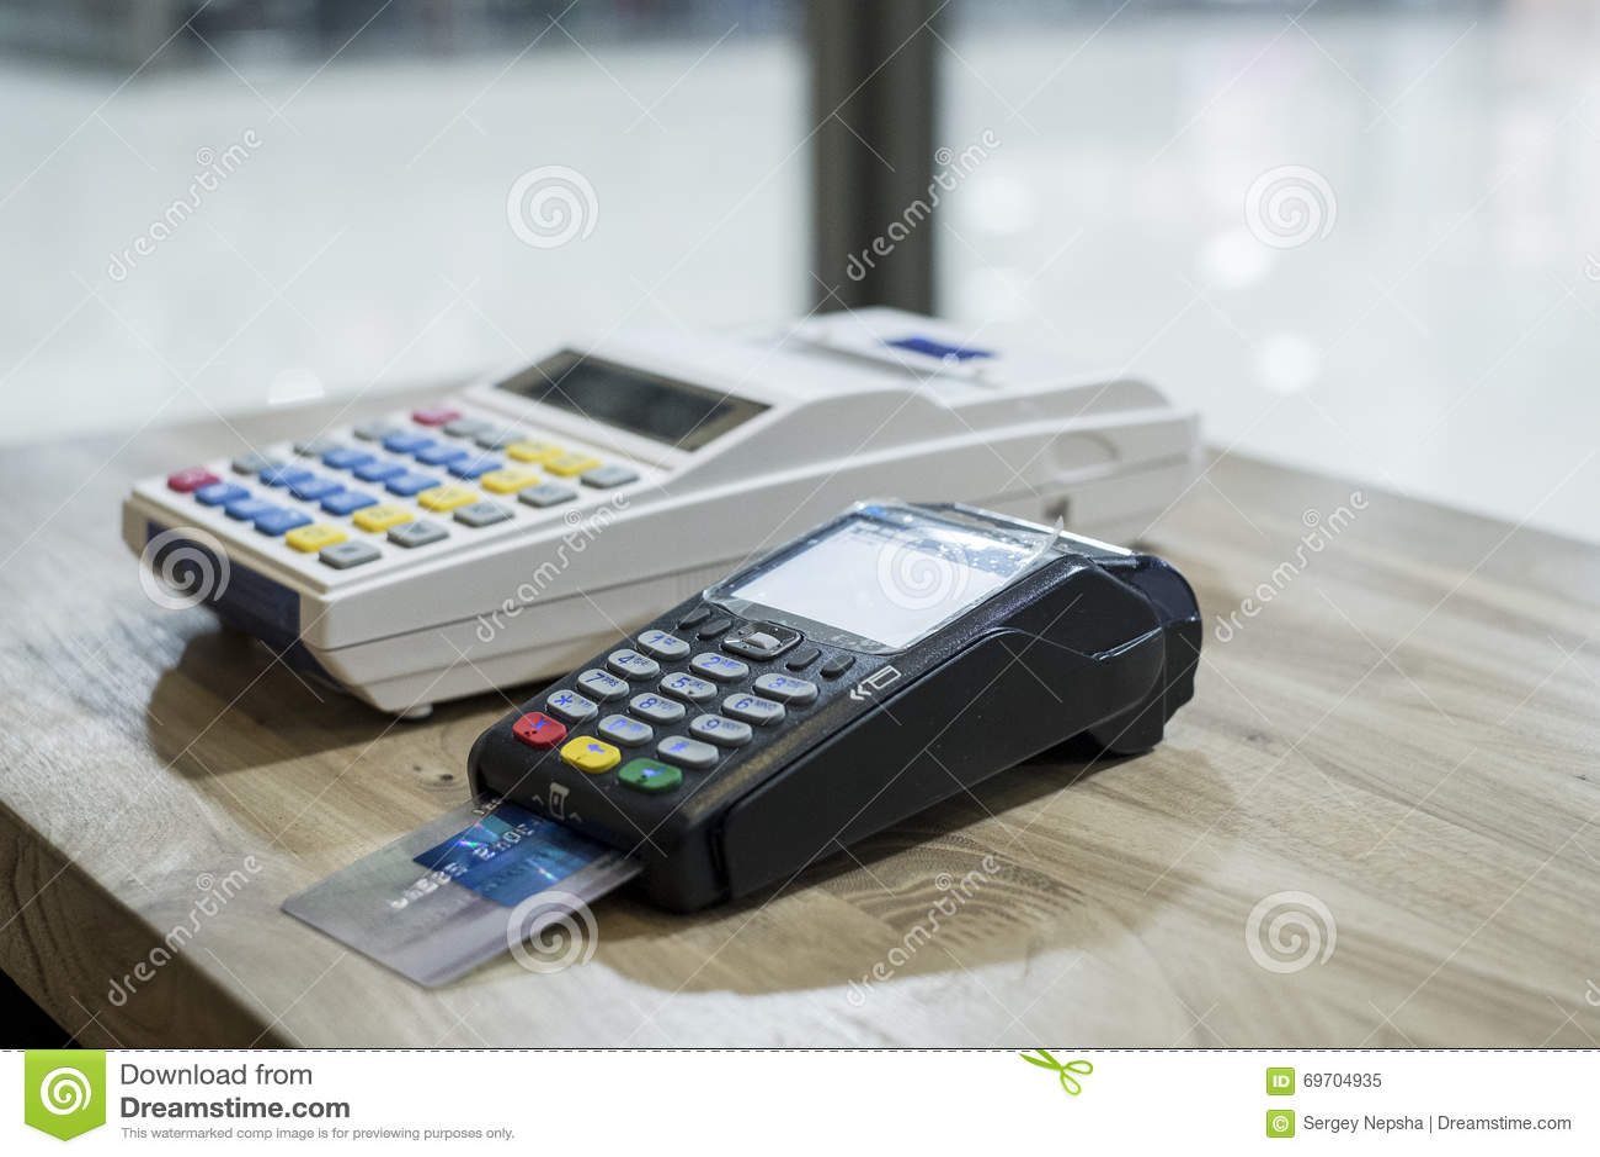 distributeur automatique de billets image stock image 69704935. Black Bedroom Furniture Sets. Home Design Ideas